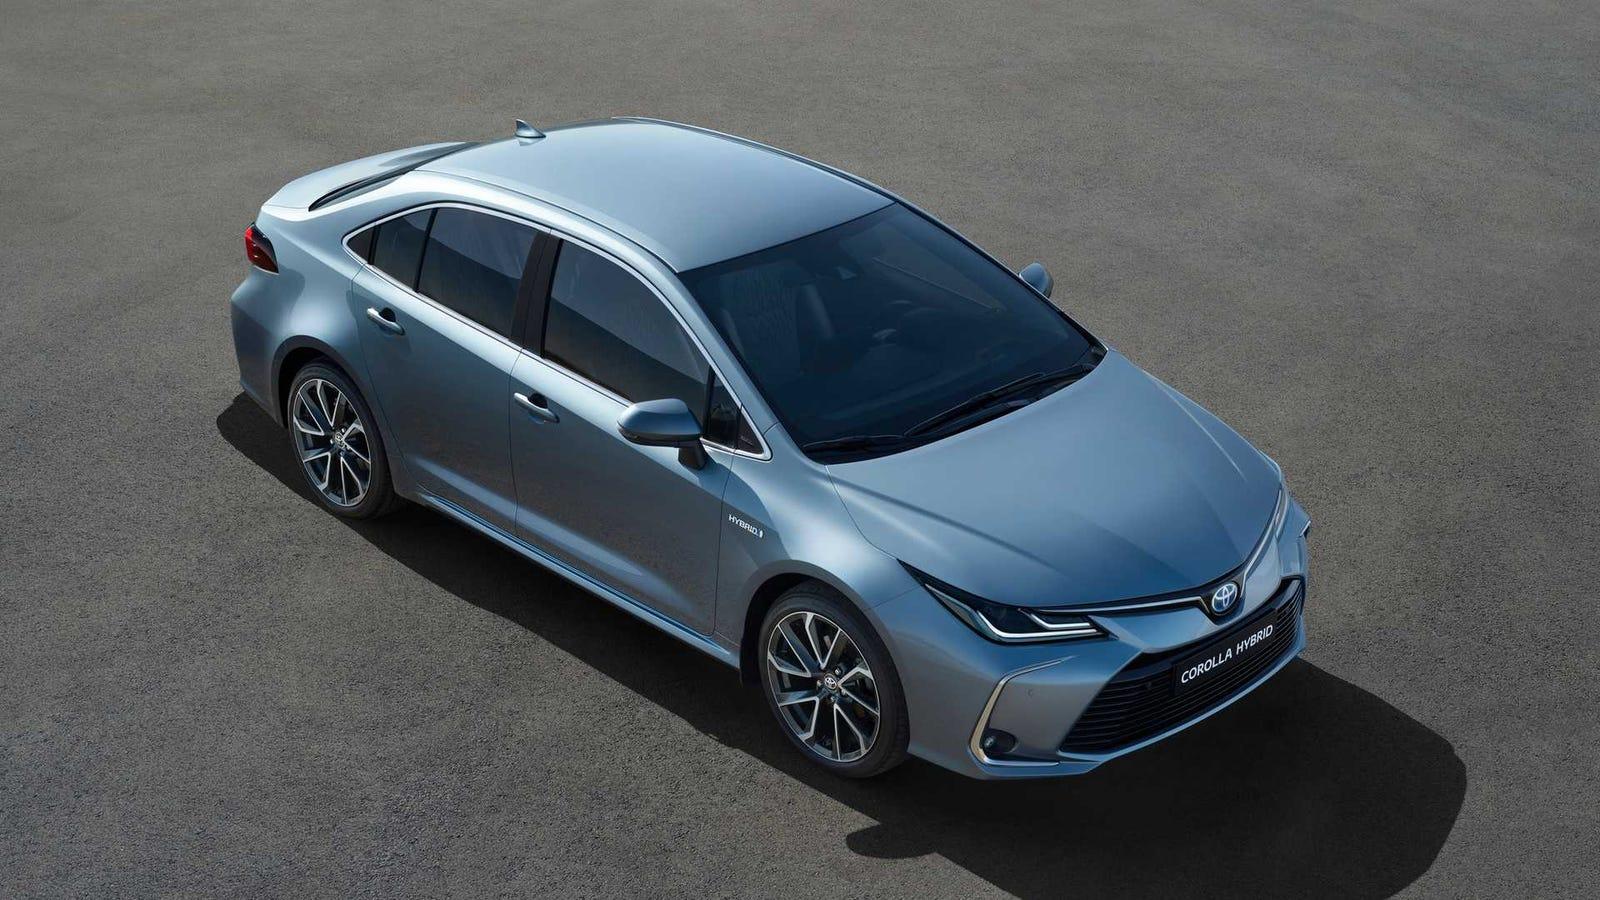 The 2020 Toyota Corolla Hybrid Gets Prius Fuel Economy Without Prius Looks - Jalopnik